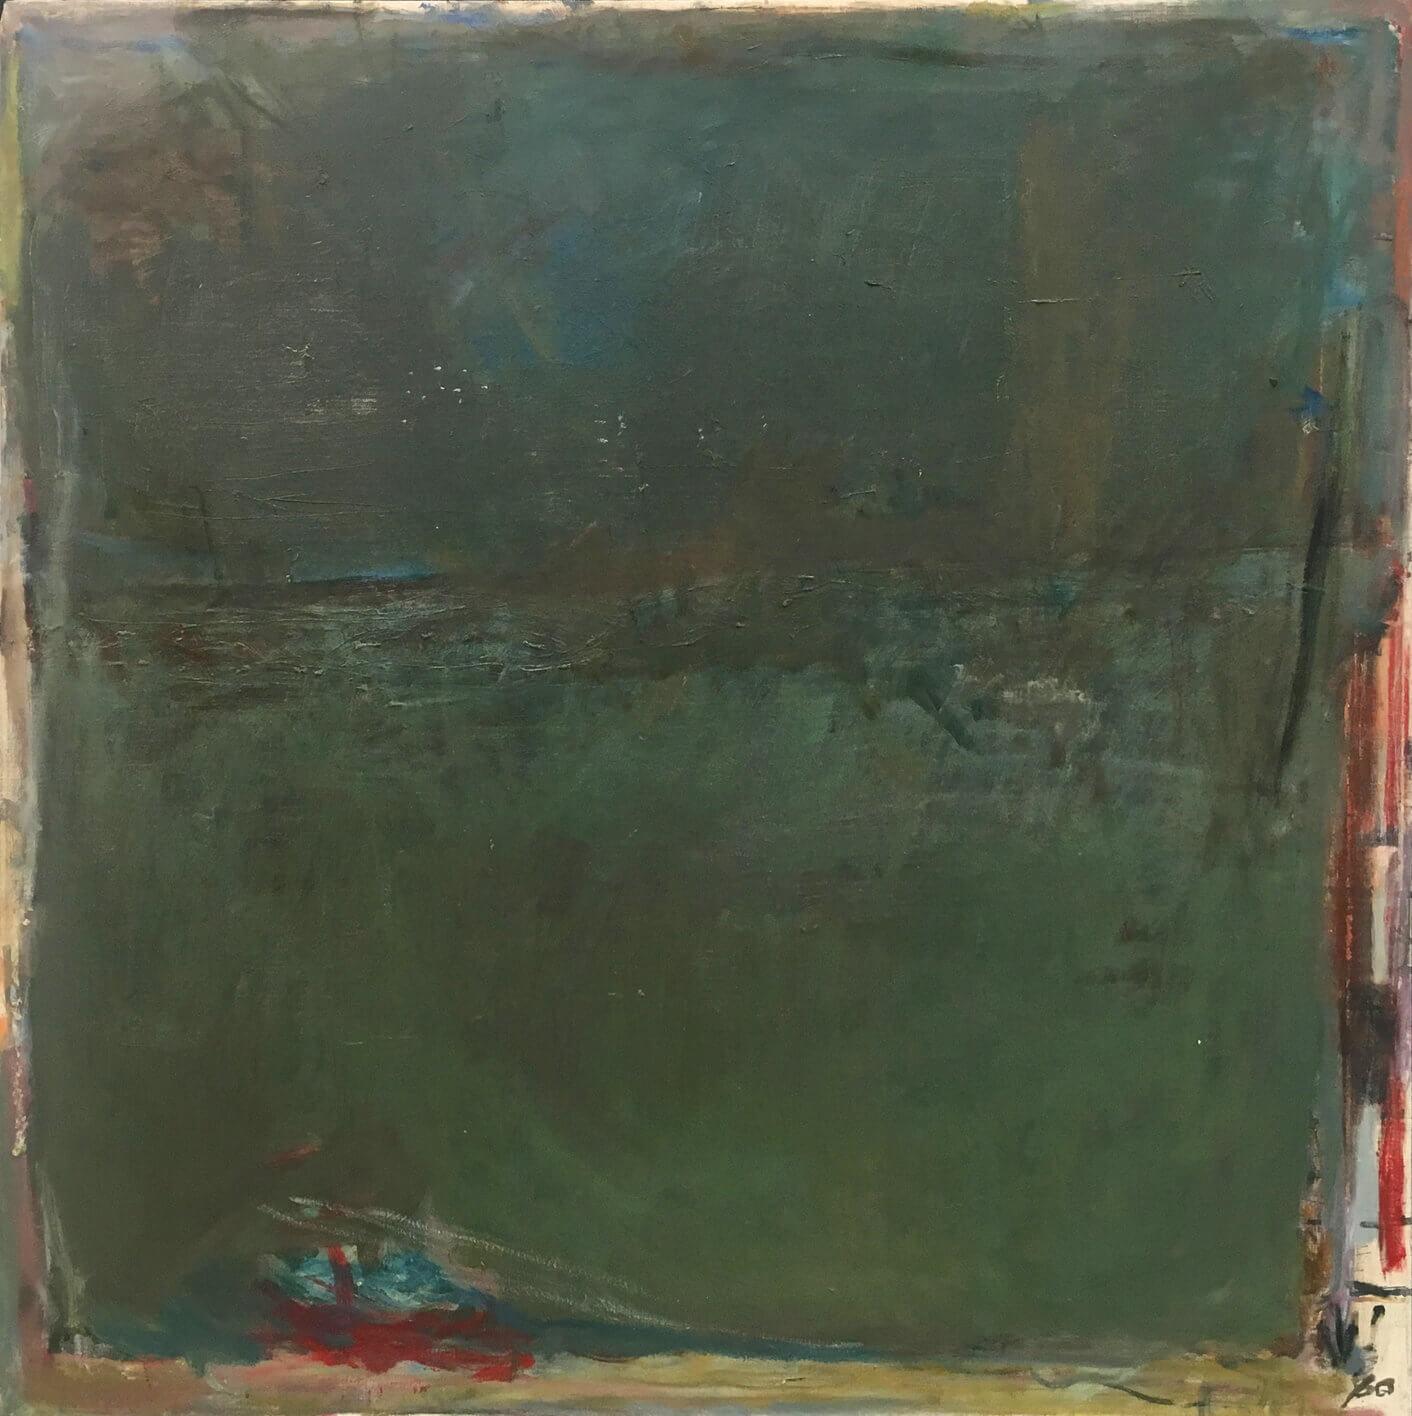 1474_Yehezkel Streichman, 1980, Oil on canvas, 100x100 cm 12,500$-1412x1416